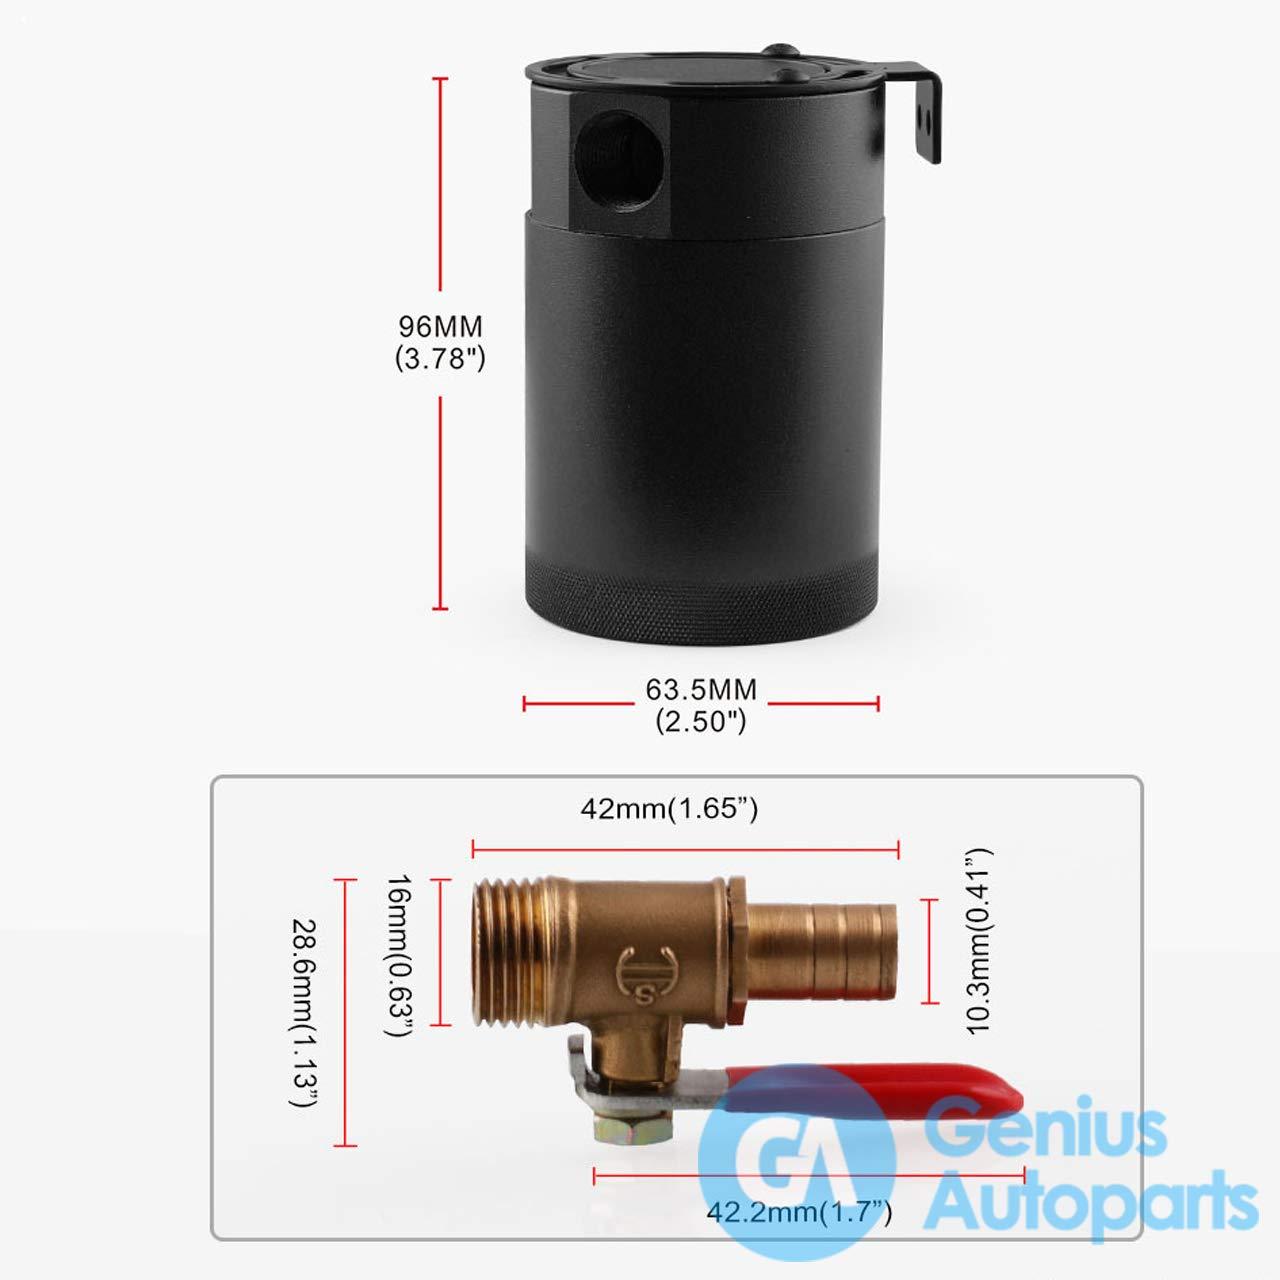 2-Hole OCC034//OCC039 Blue Genius Autoparts Baffled Oil Catch Can Aluminum Alloy